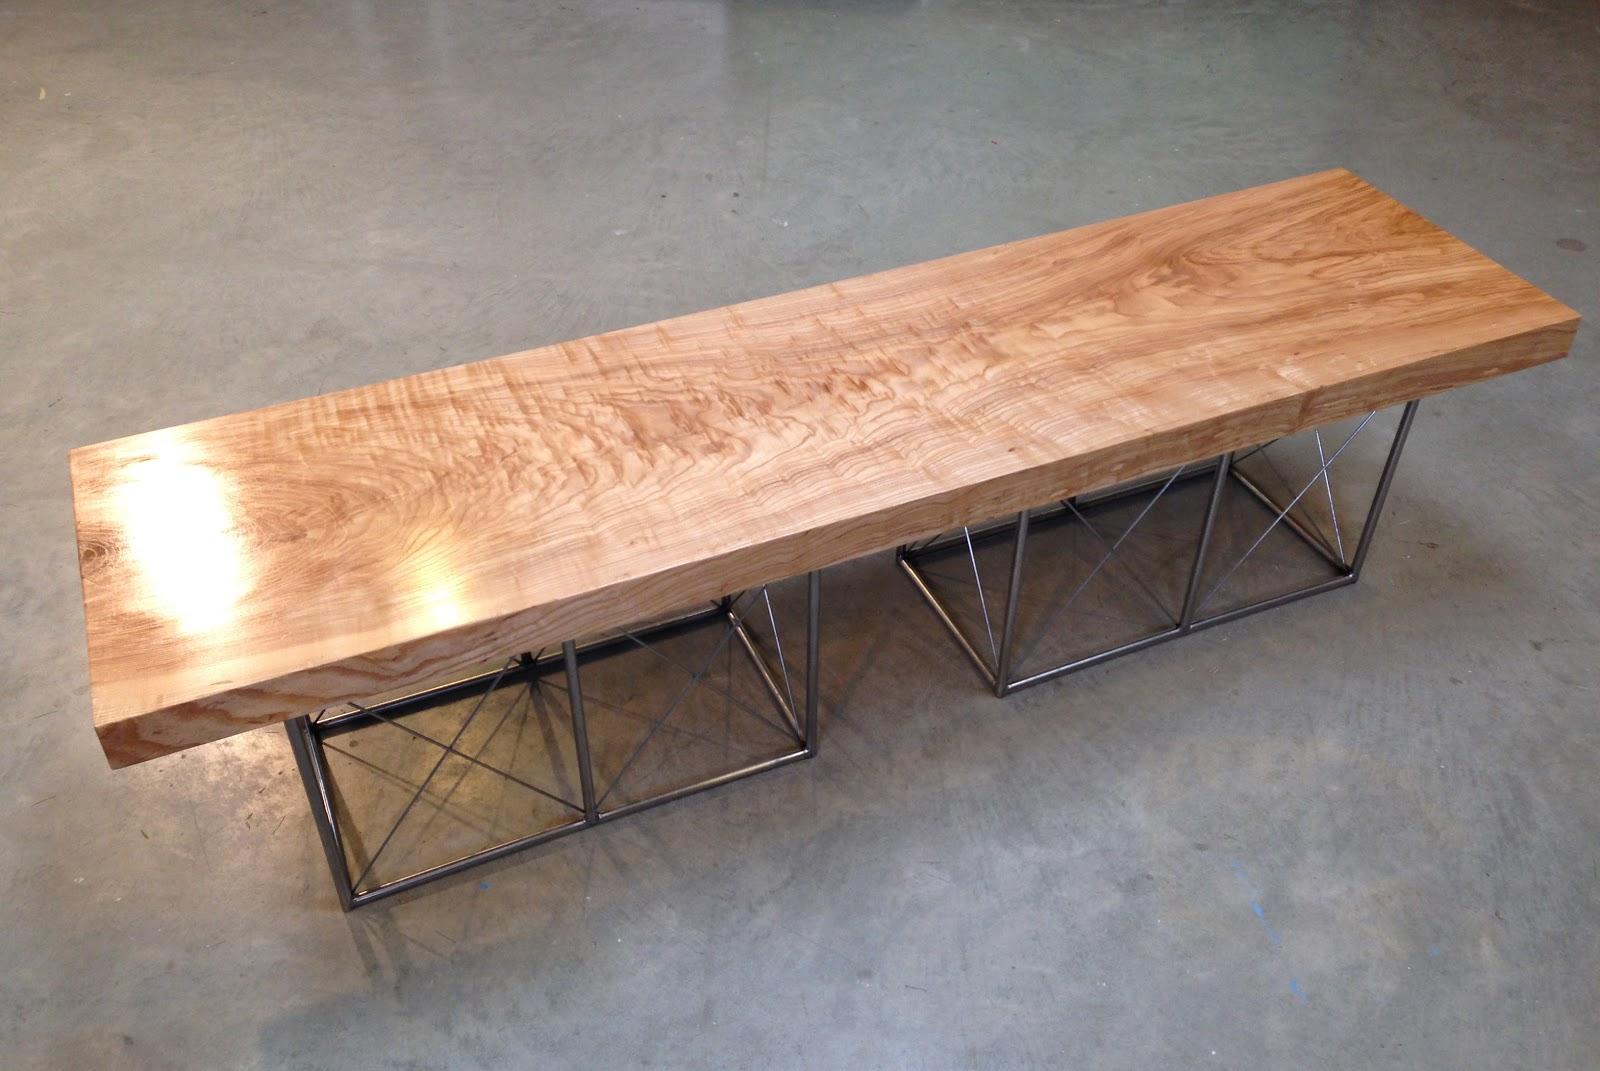 Furniture Stephen Cartwright Studio - Cartwright furniture